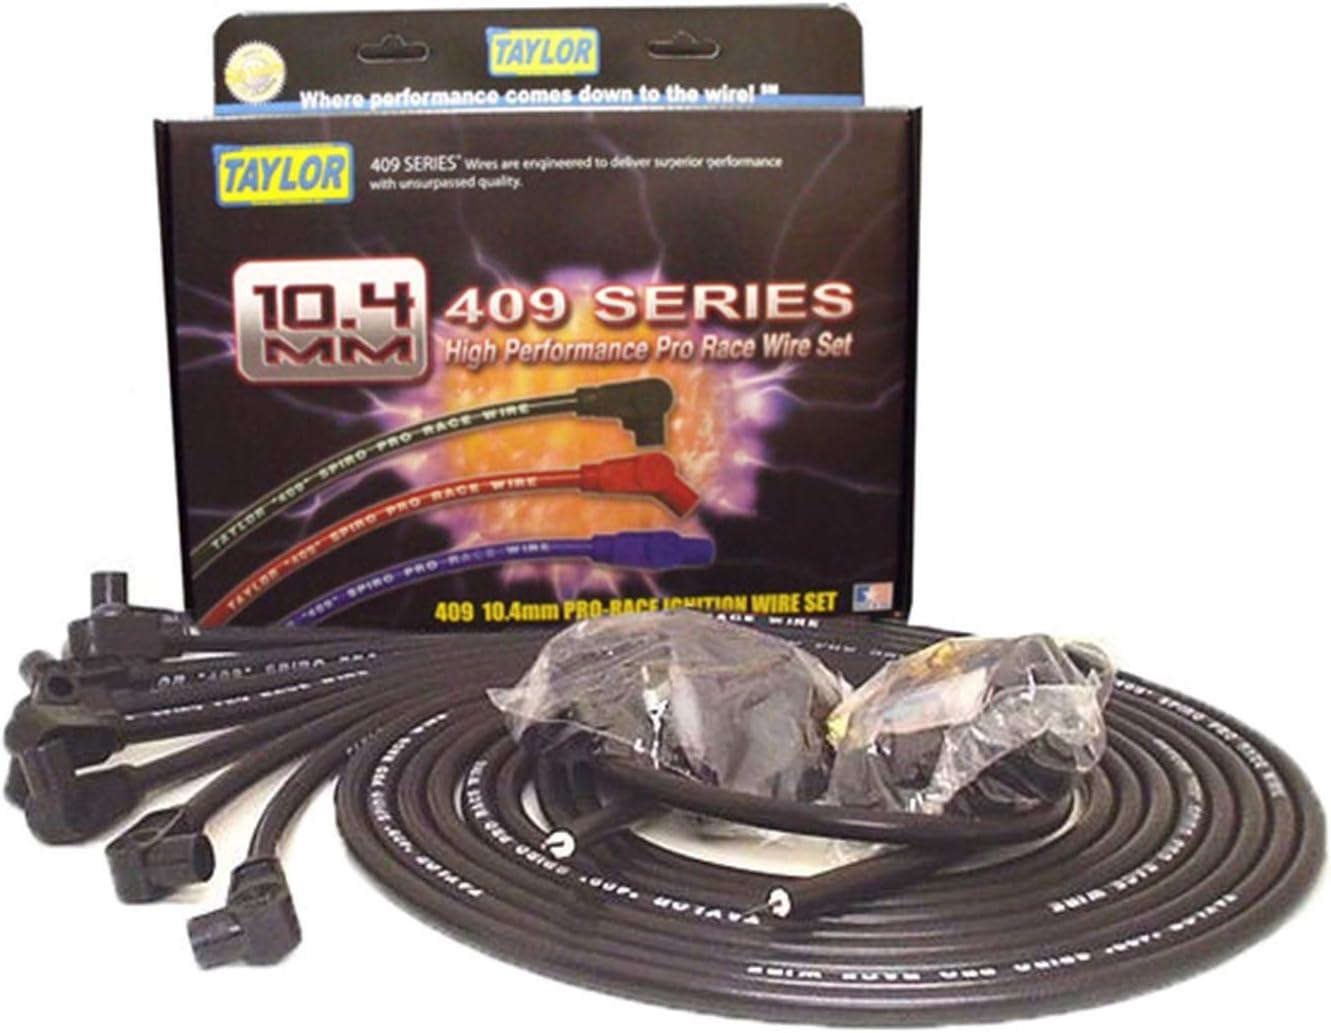 180 Deg Stock 10.625 in Plug Boot 409 Spiro-Pro 10.4mm Ignition Wire Set Taylor Cable 79661 409 Spiro-Pro 10.4mm Ignition Wire Set Blue LT1 // EcoTec3